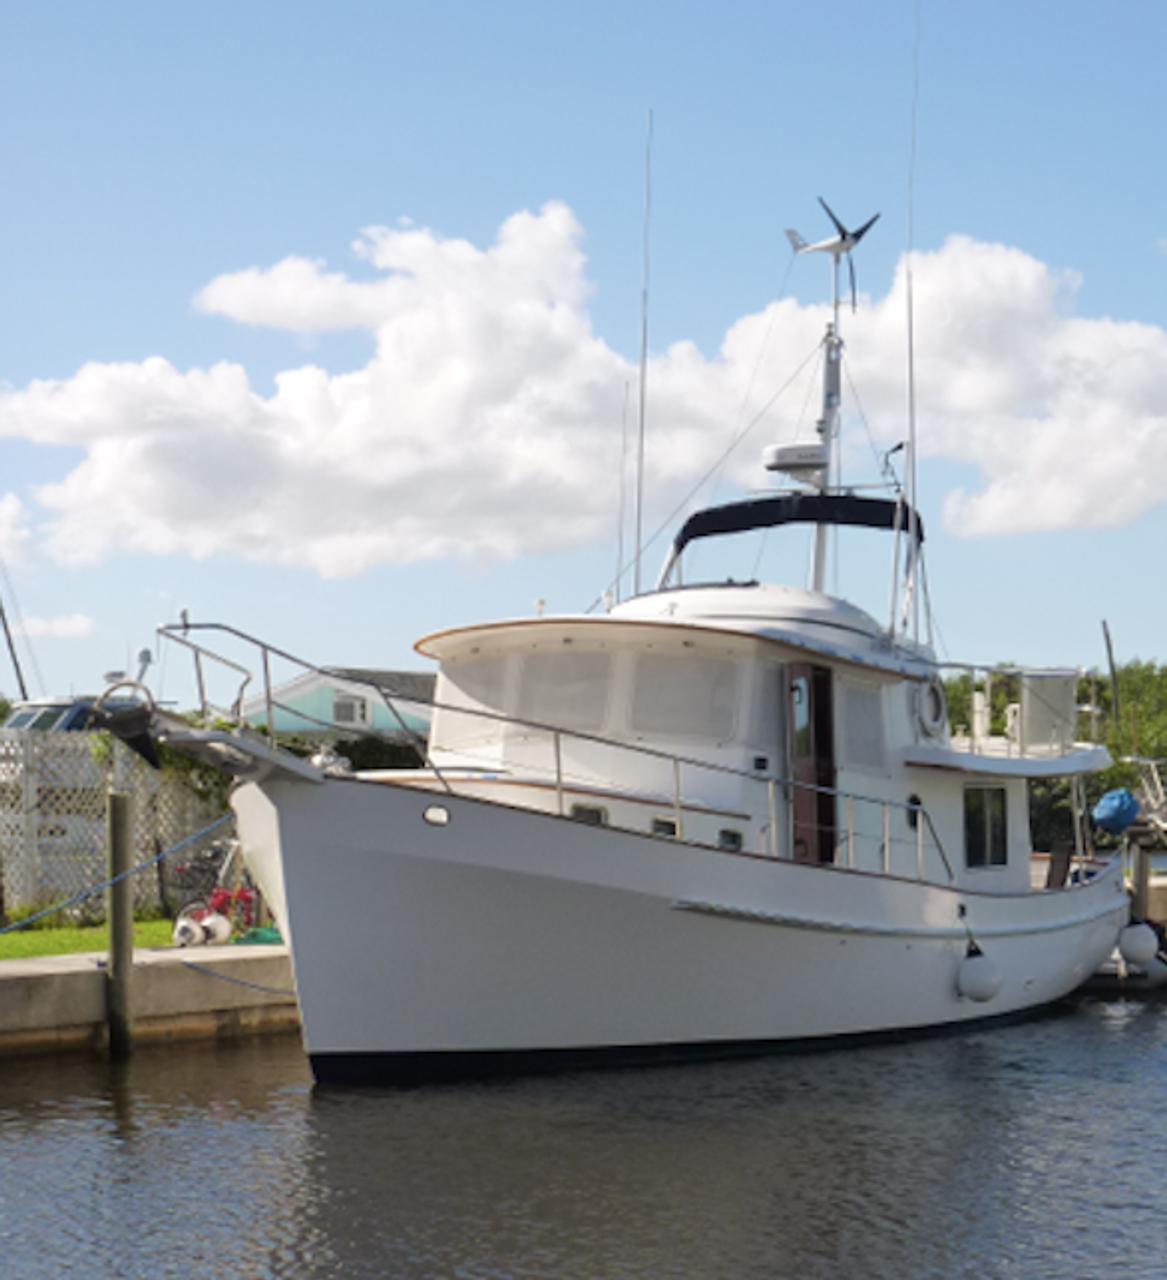 Marine Kinetix custom mounted on a trawler (Dov Lazar in the Bahamas)